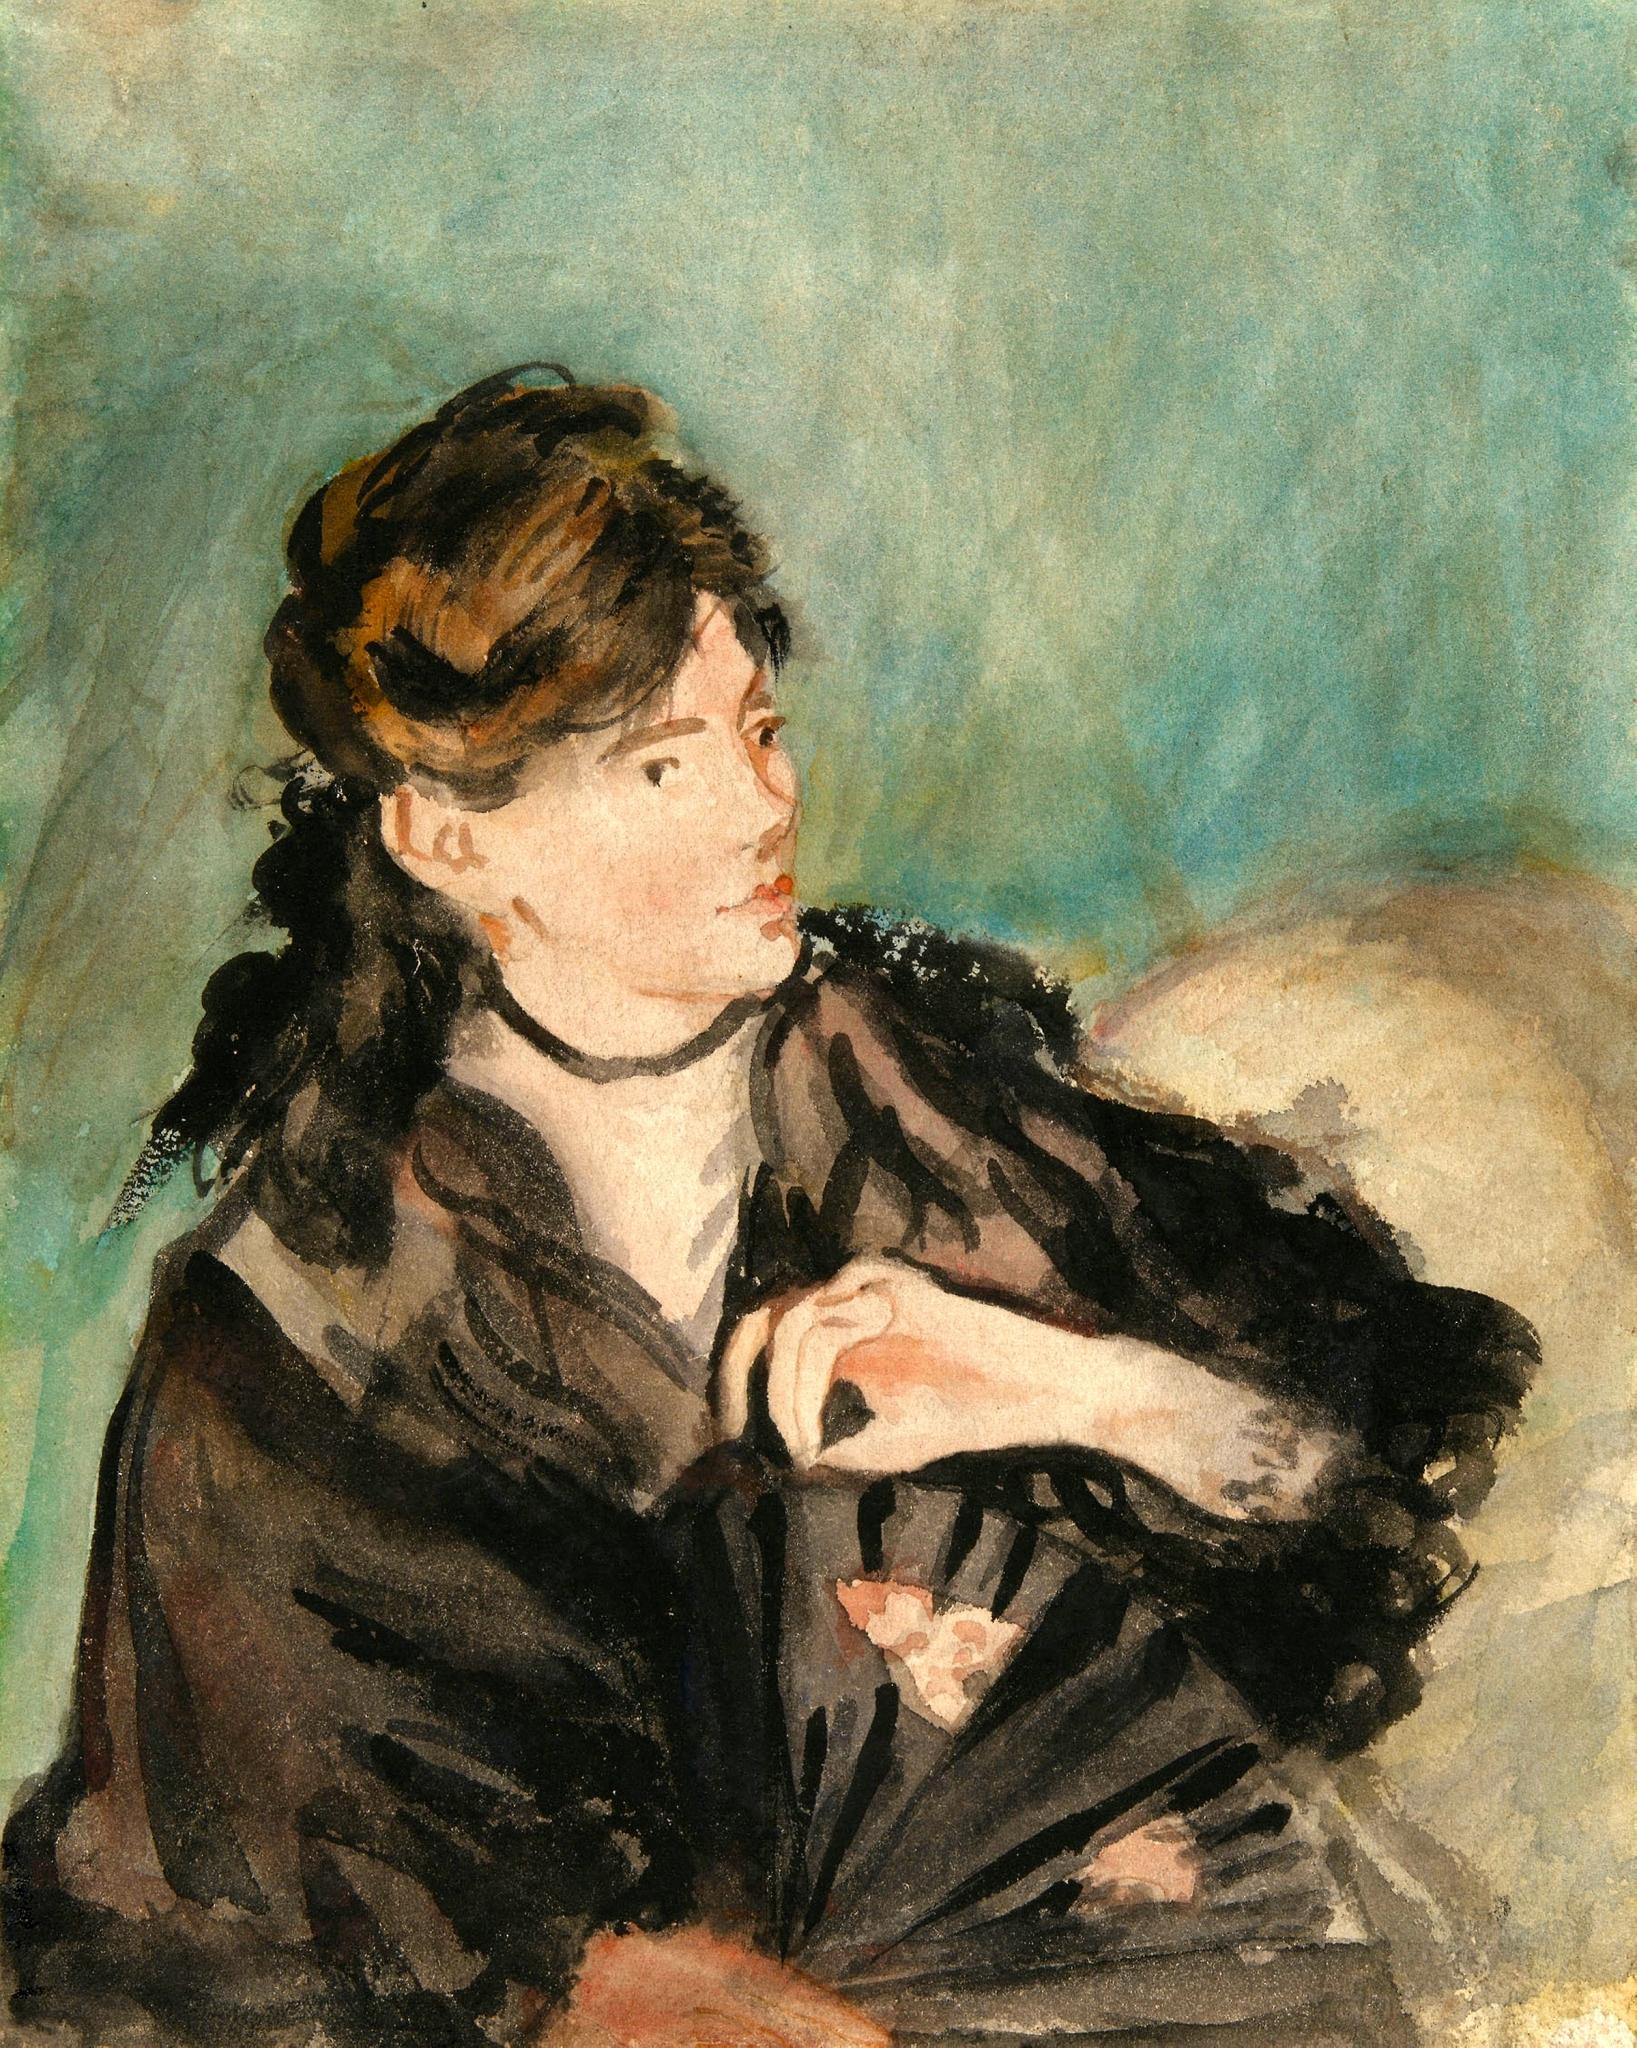 peinture, musée d'orsay, impressionnisme berthe morisot,